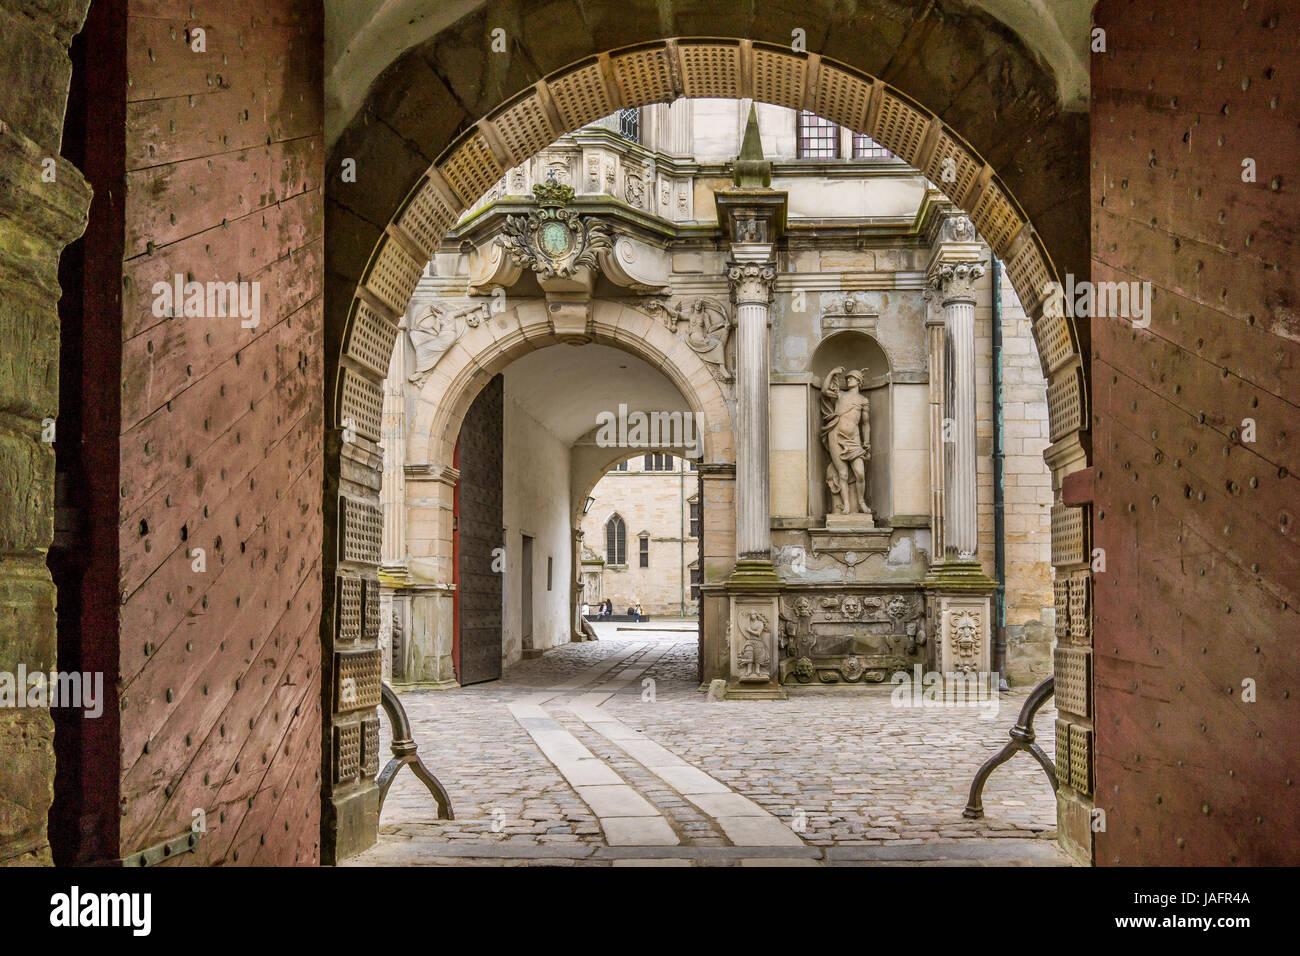 Portal into Kronborg, the  castle  of Hamlet in Elsinore, Denmark, May 30, 2017 Stock Photo